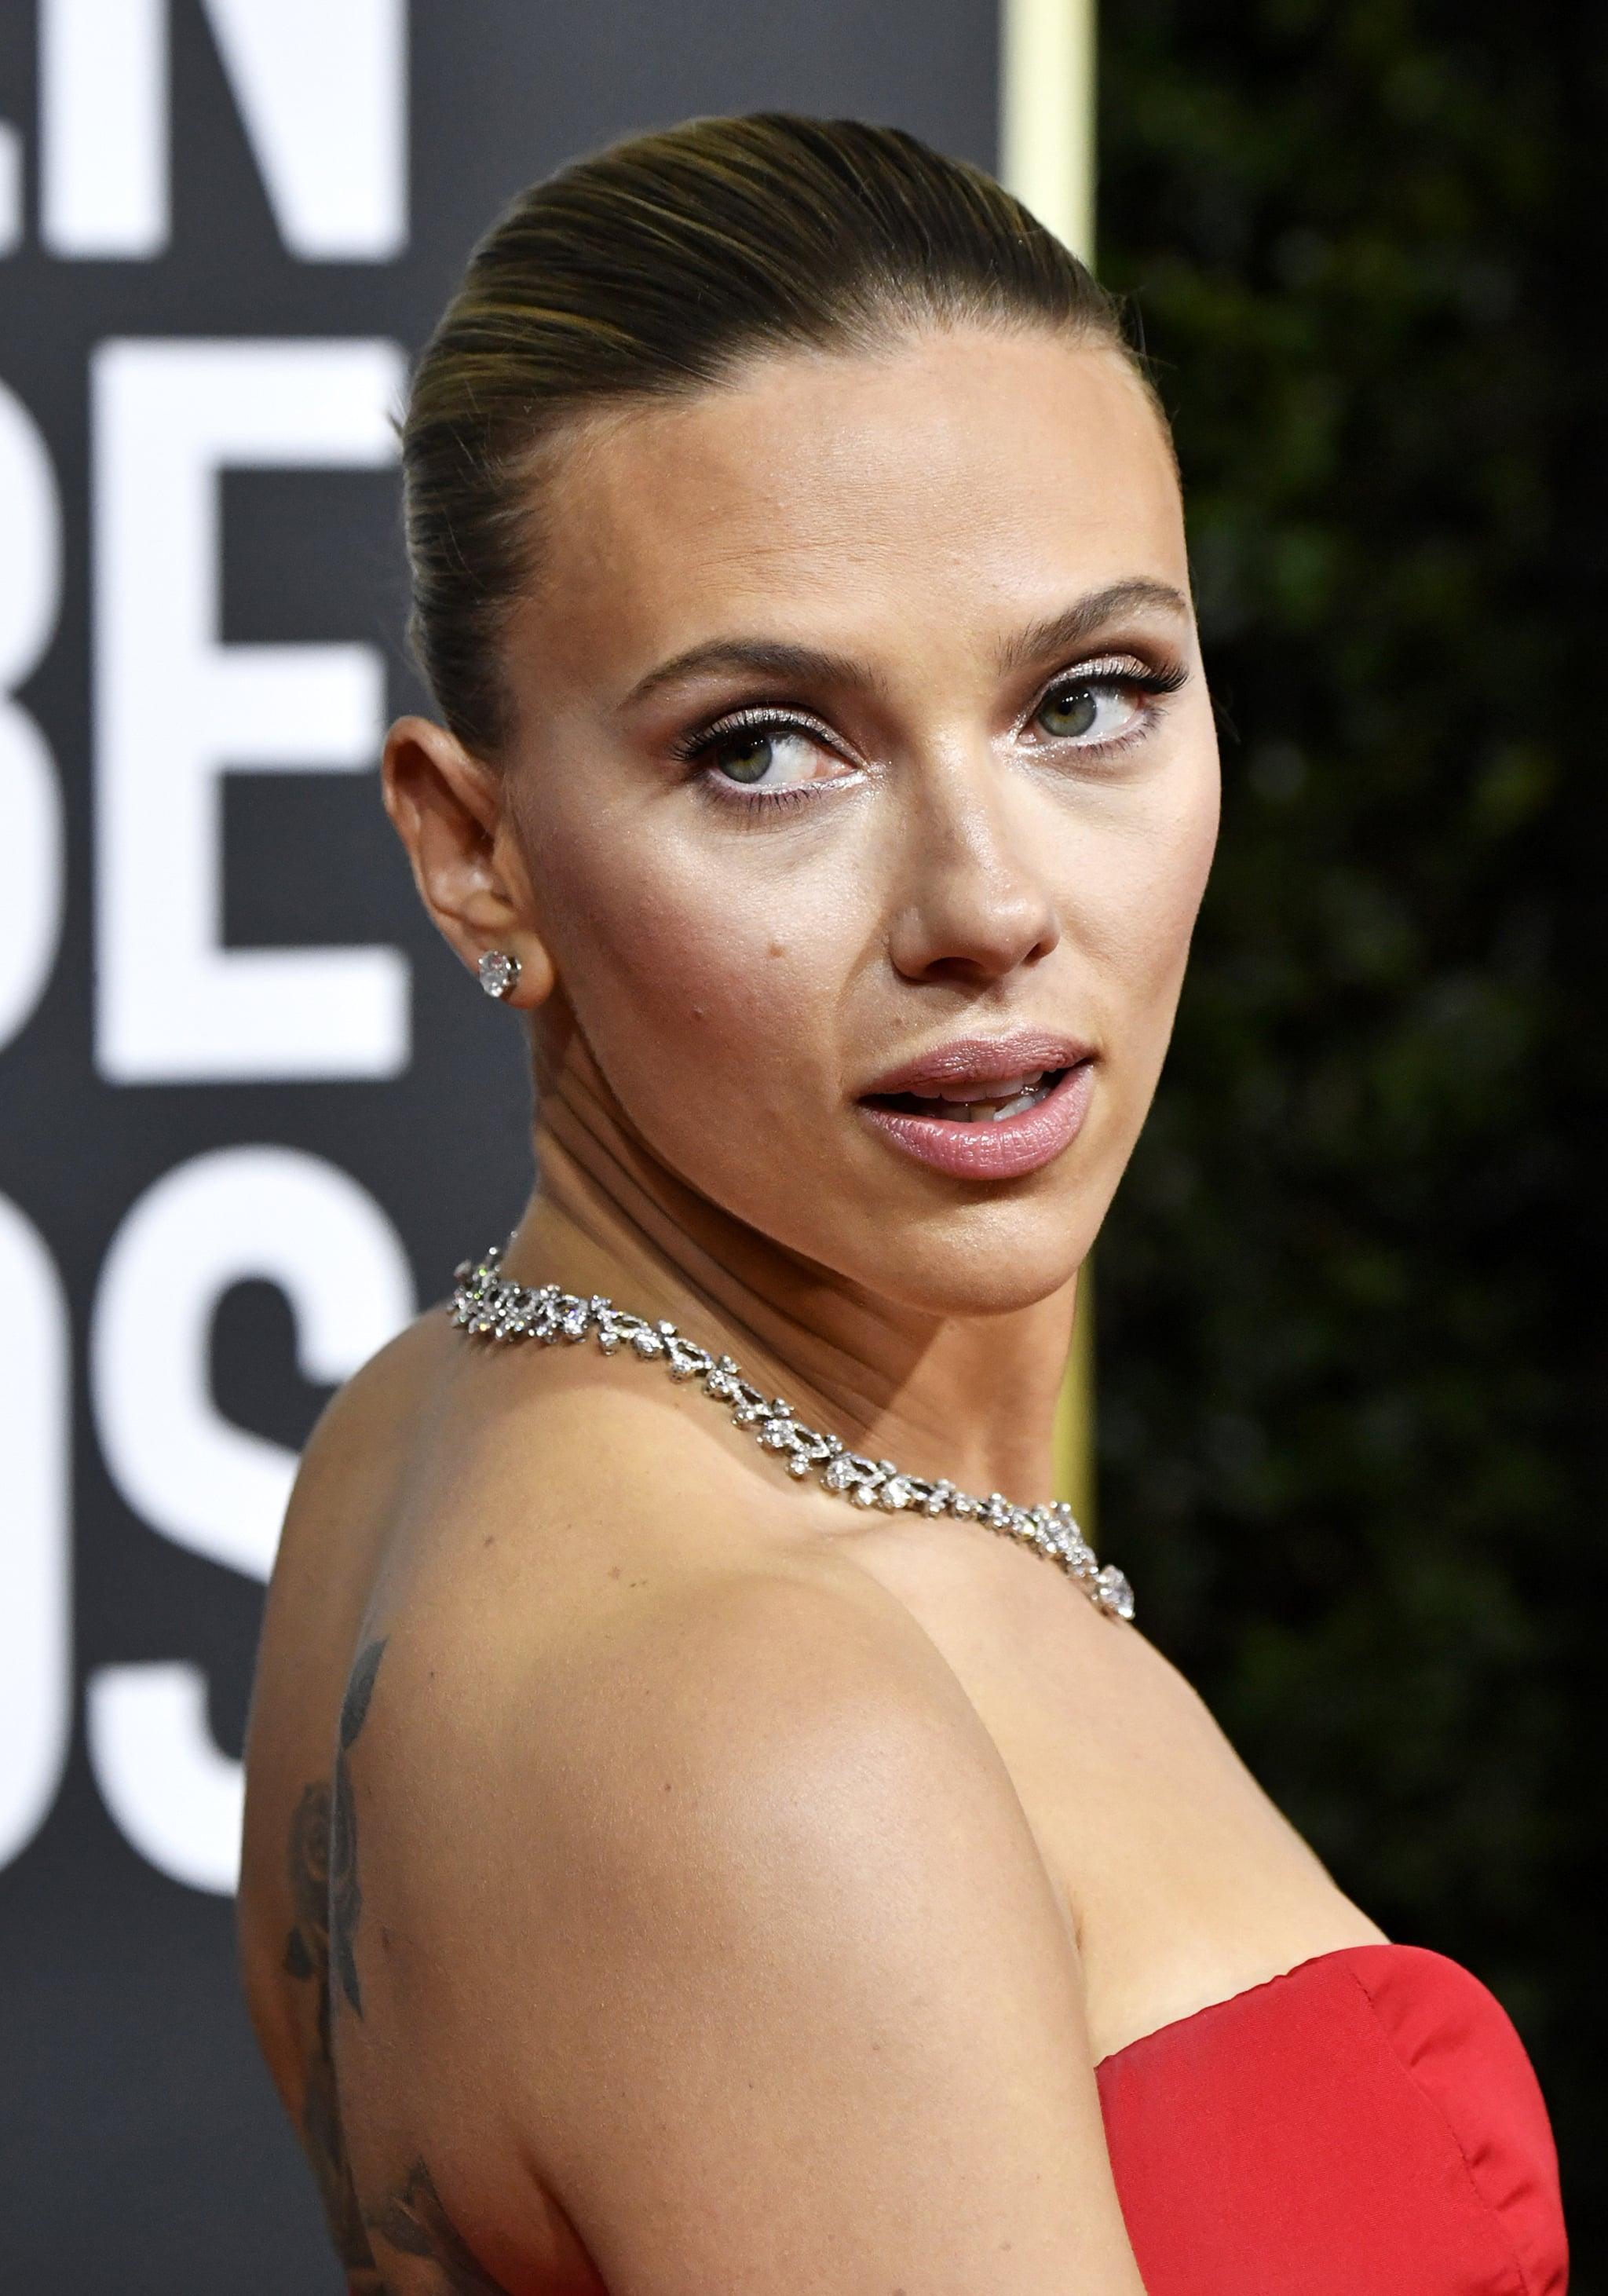 Scarlett Johansson's Back Tattoo   POPSUGAR Celebrity